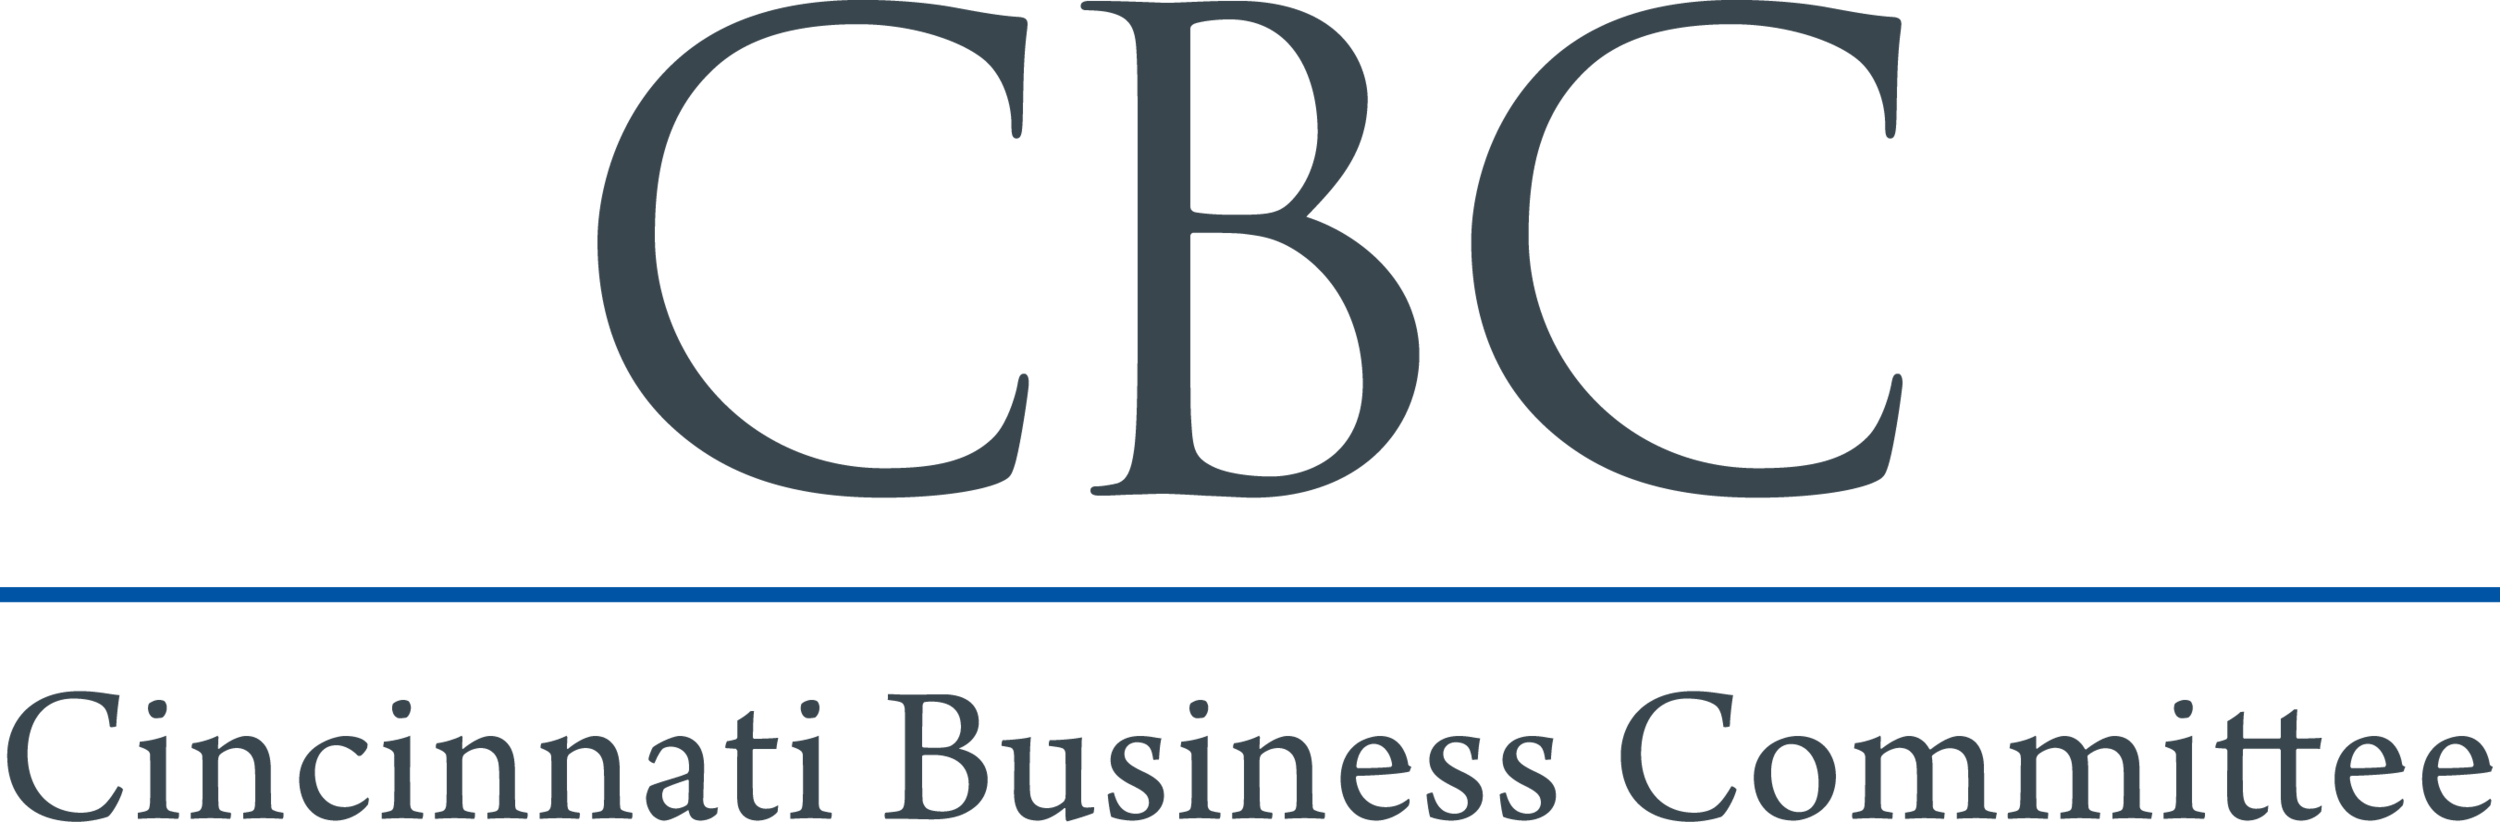 Cincinnati Business Committee.png